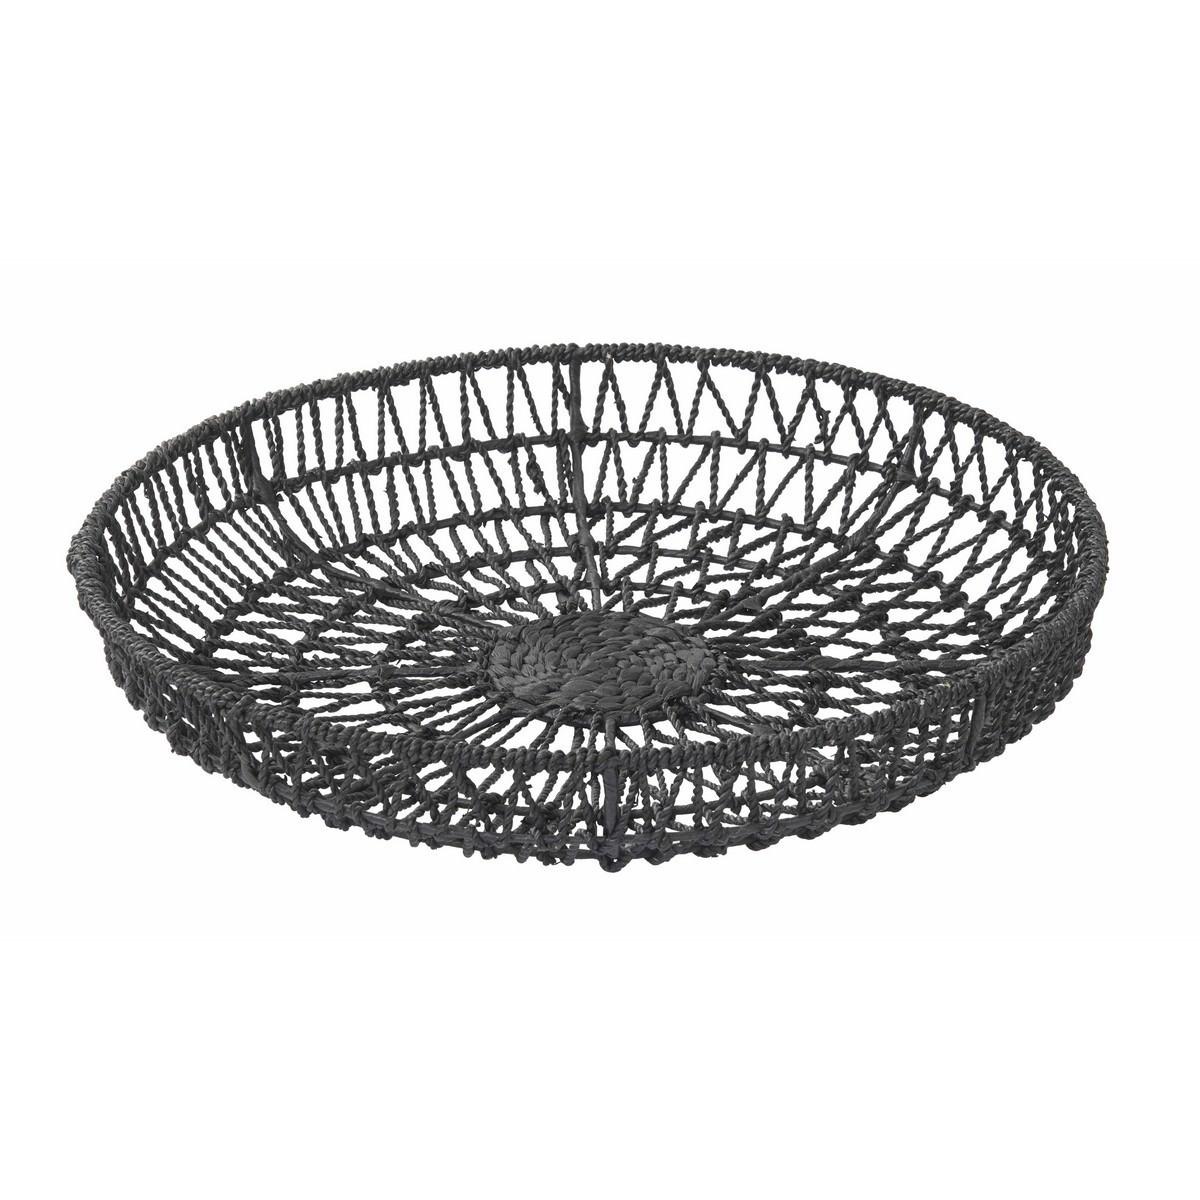 Lenexa Handwoven Water Hyacinth Basket/Wall Decor